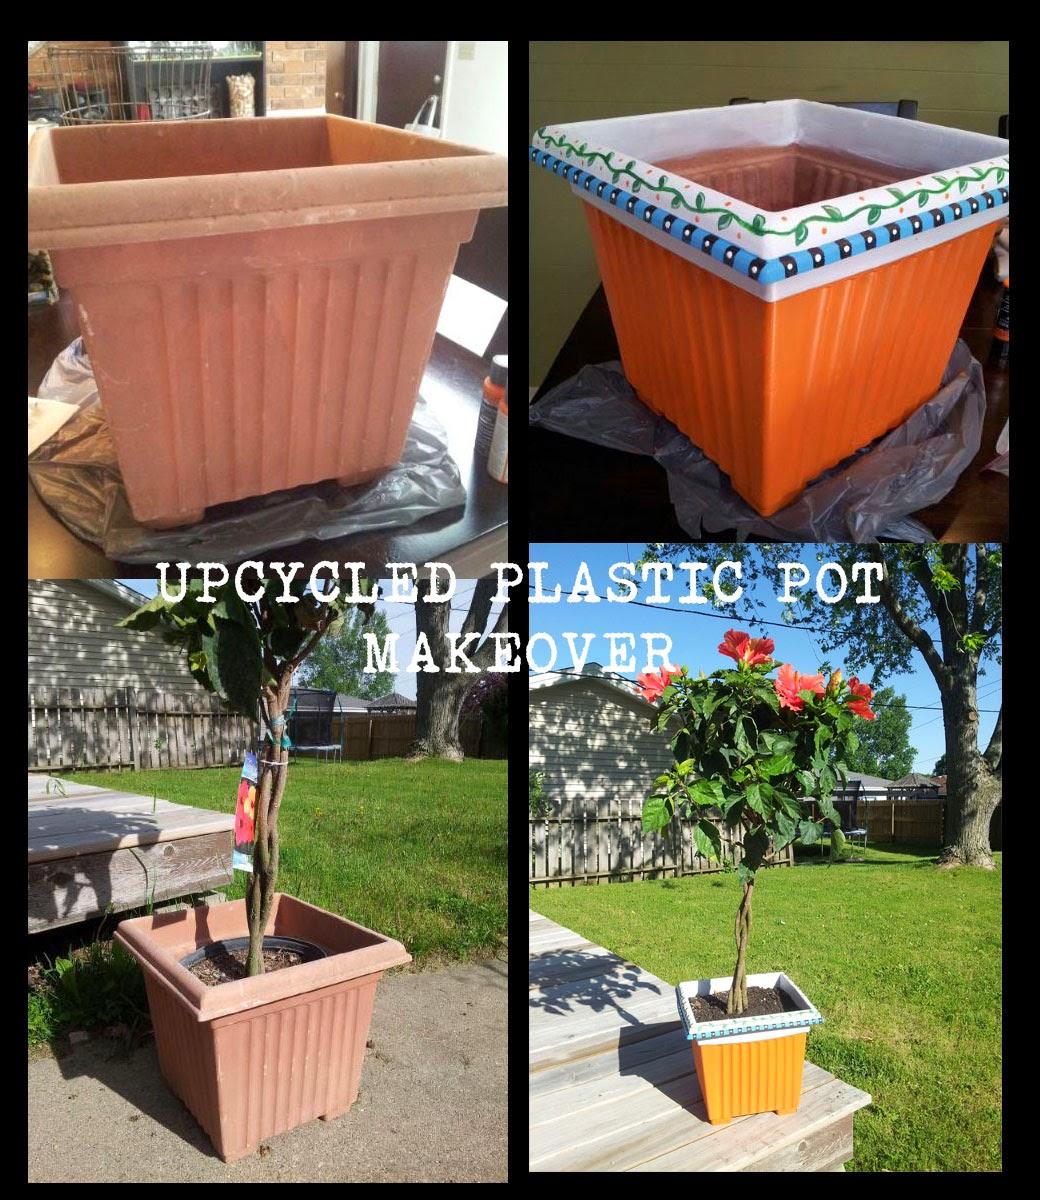 Upcycled Plastic Pot Makeover - DecoArt Americana Multi-Surface Satin Paint #decoart #americanapaints #paintingtutorial